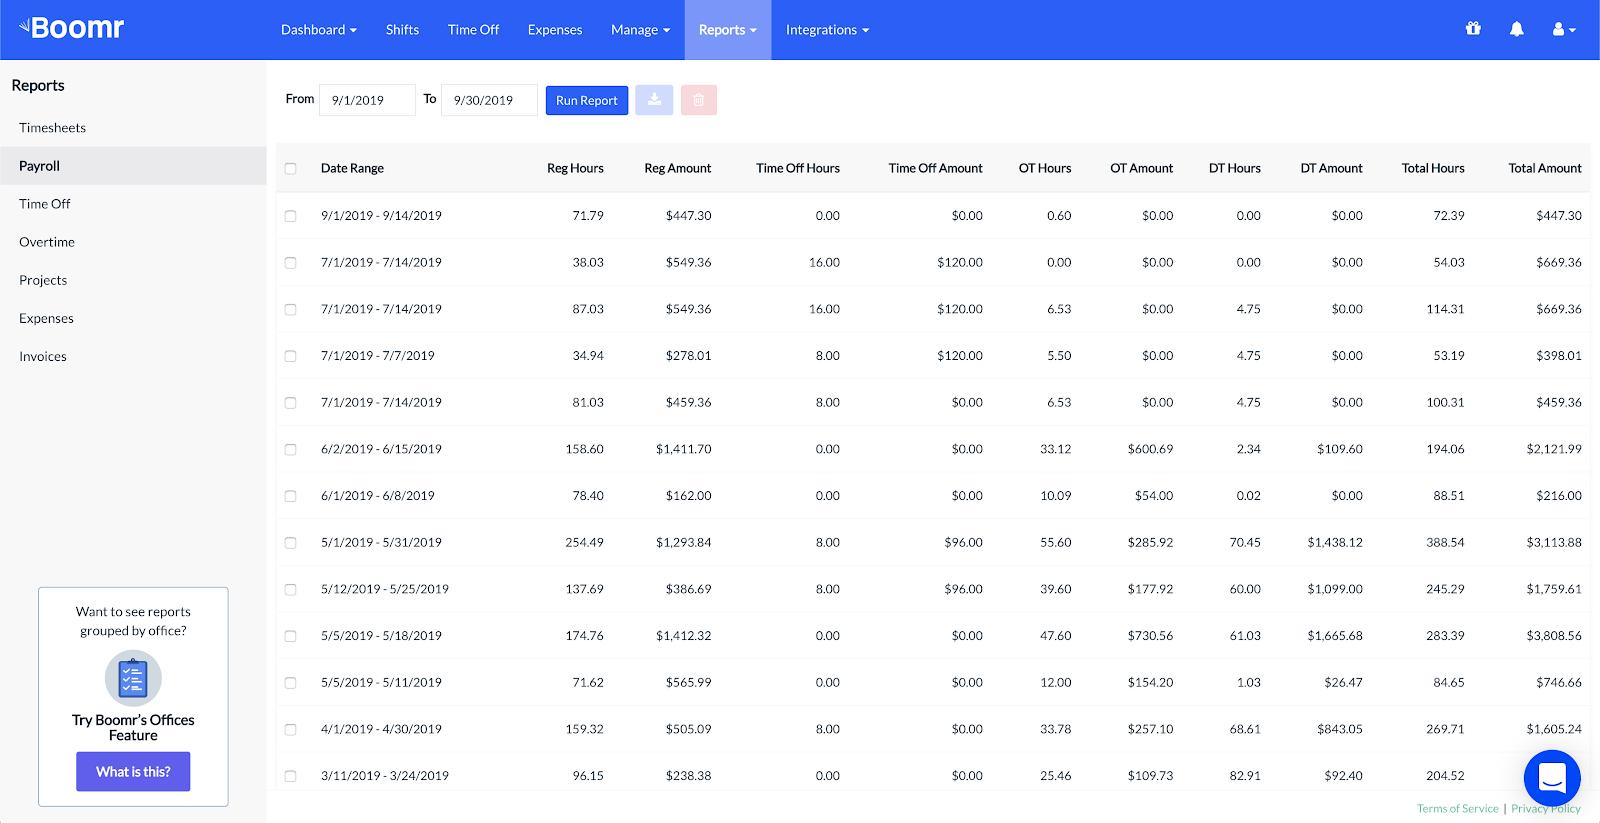 Screenshot showing the Payroll report main dashboard